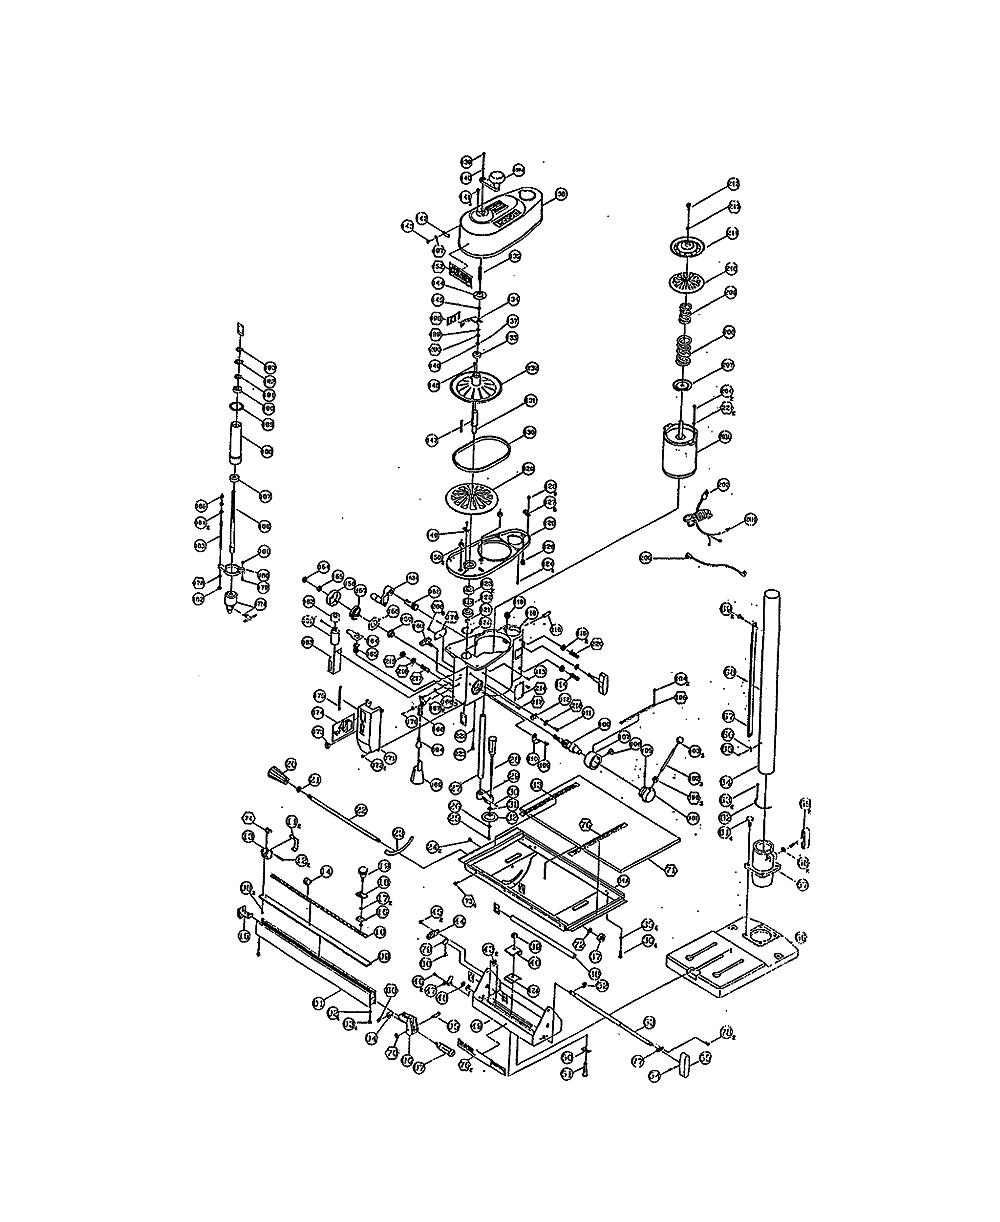 Buy Ryobi Wdp1850 Replacement Tool Parts